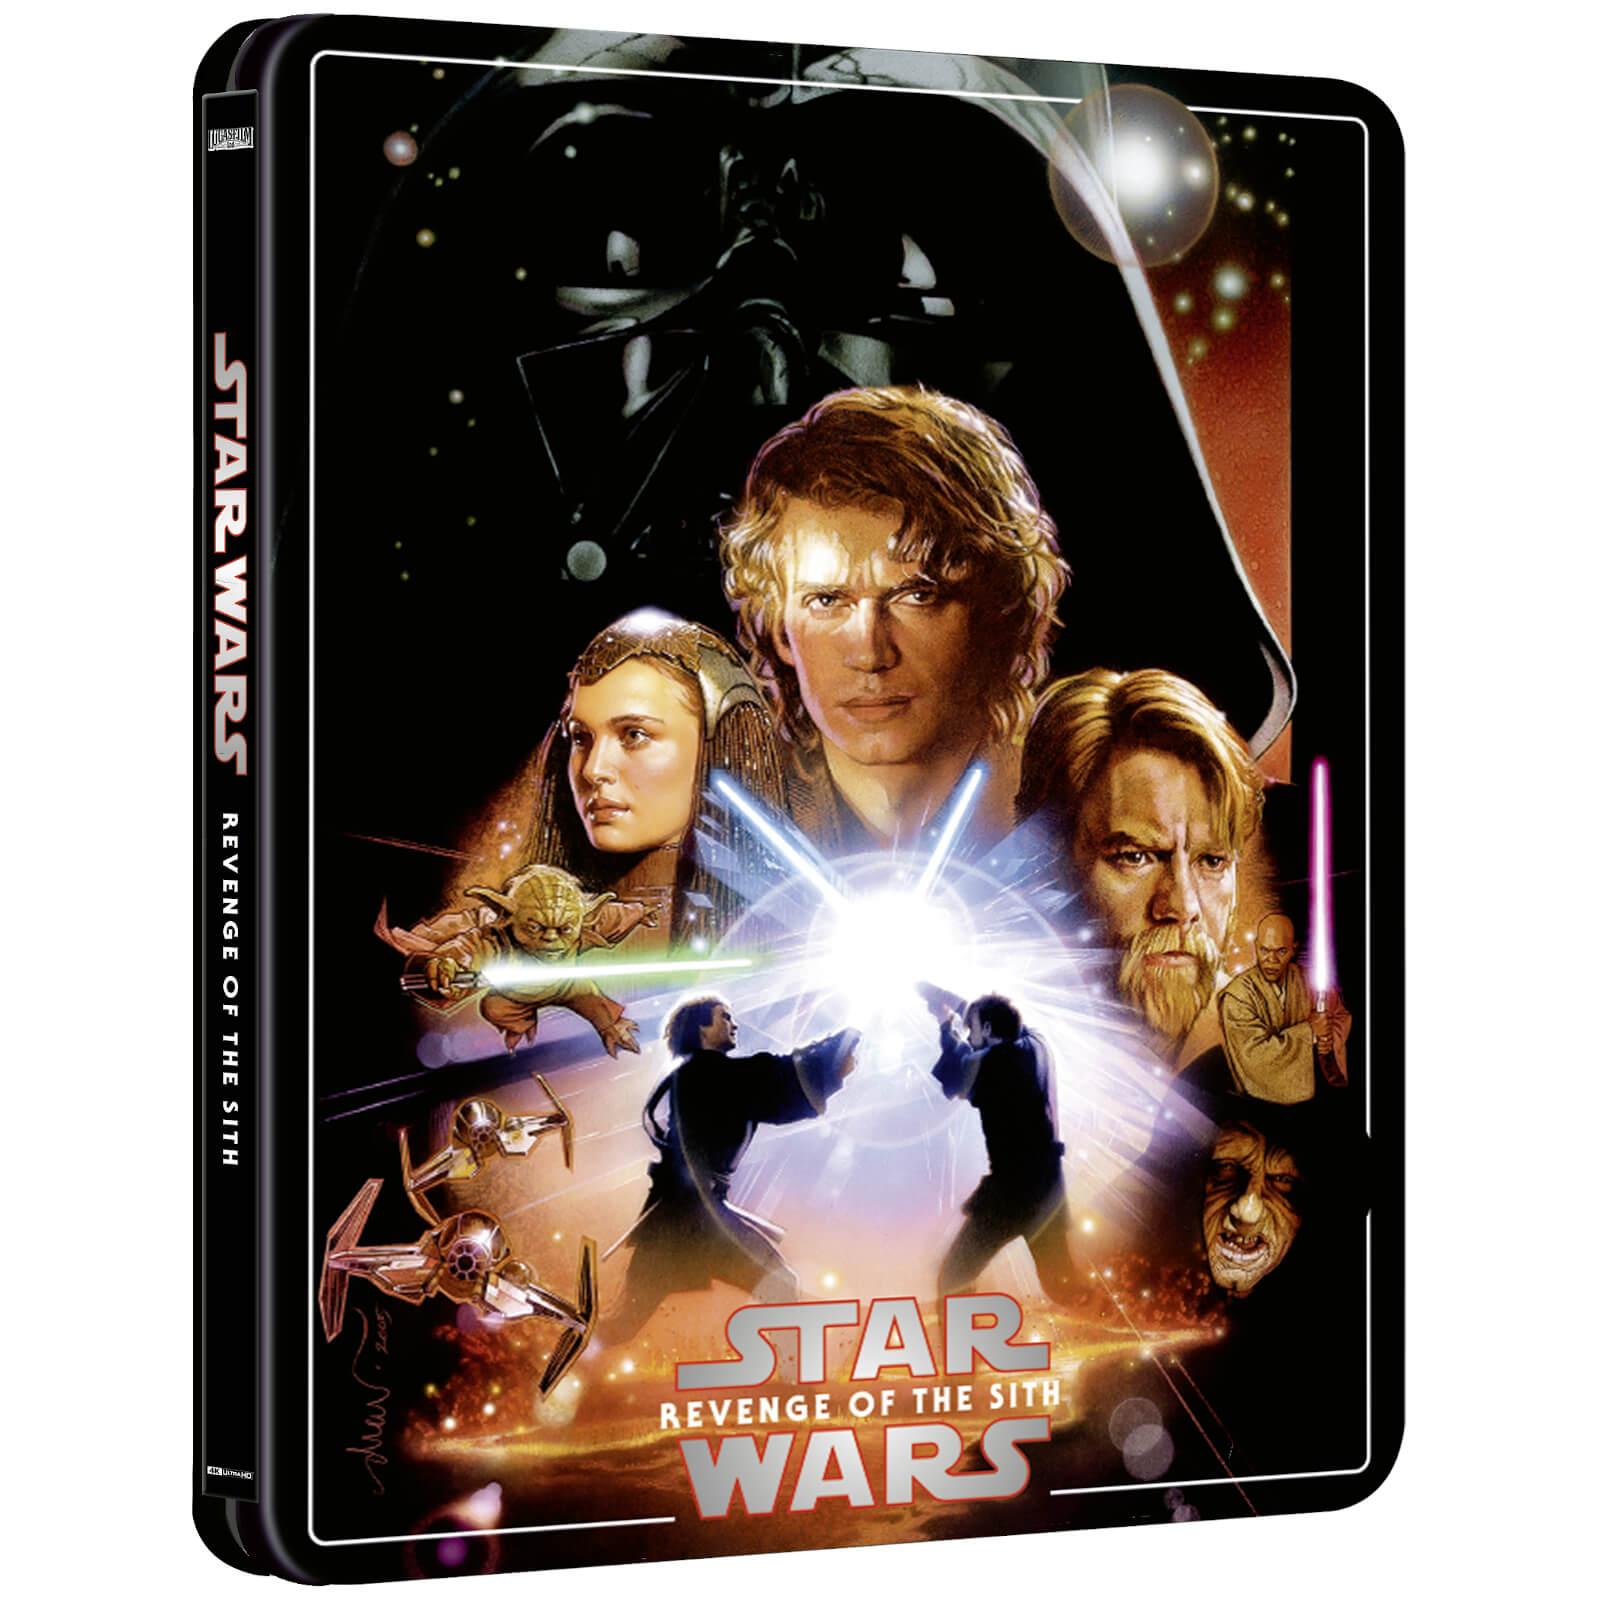 Star Wars: Revenge of the Sith (Zavvi Steelbook)